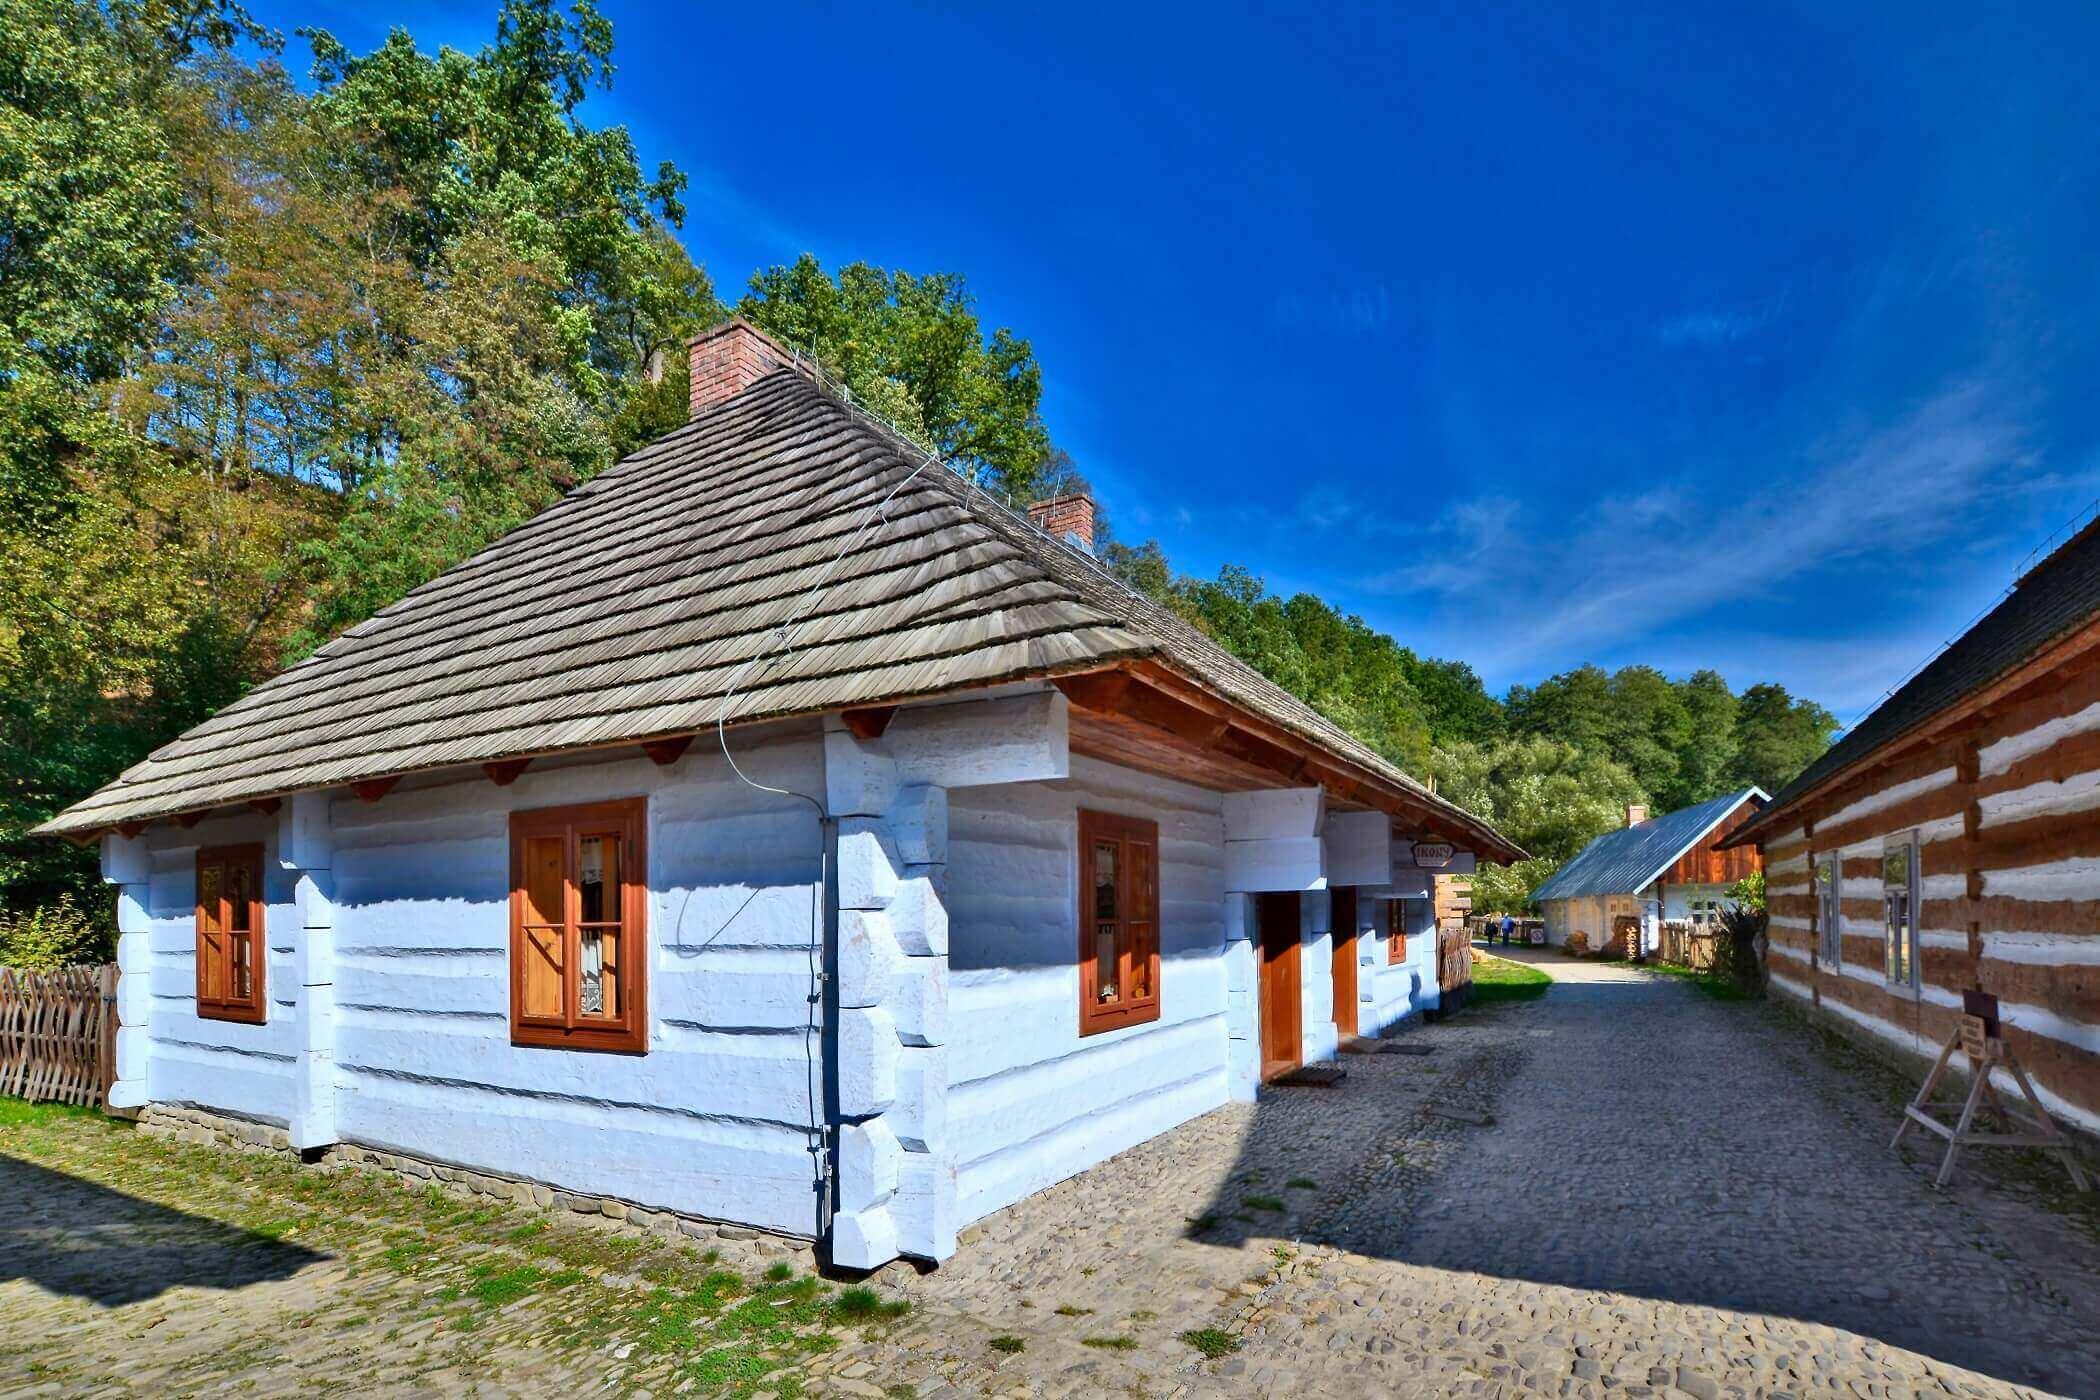 Najciekawsze atrakcje Podkarpacia - Skansen w Sanok